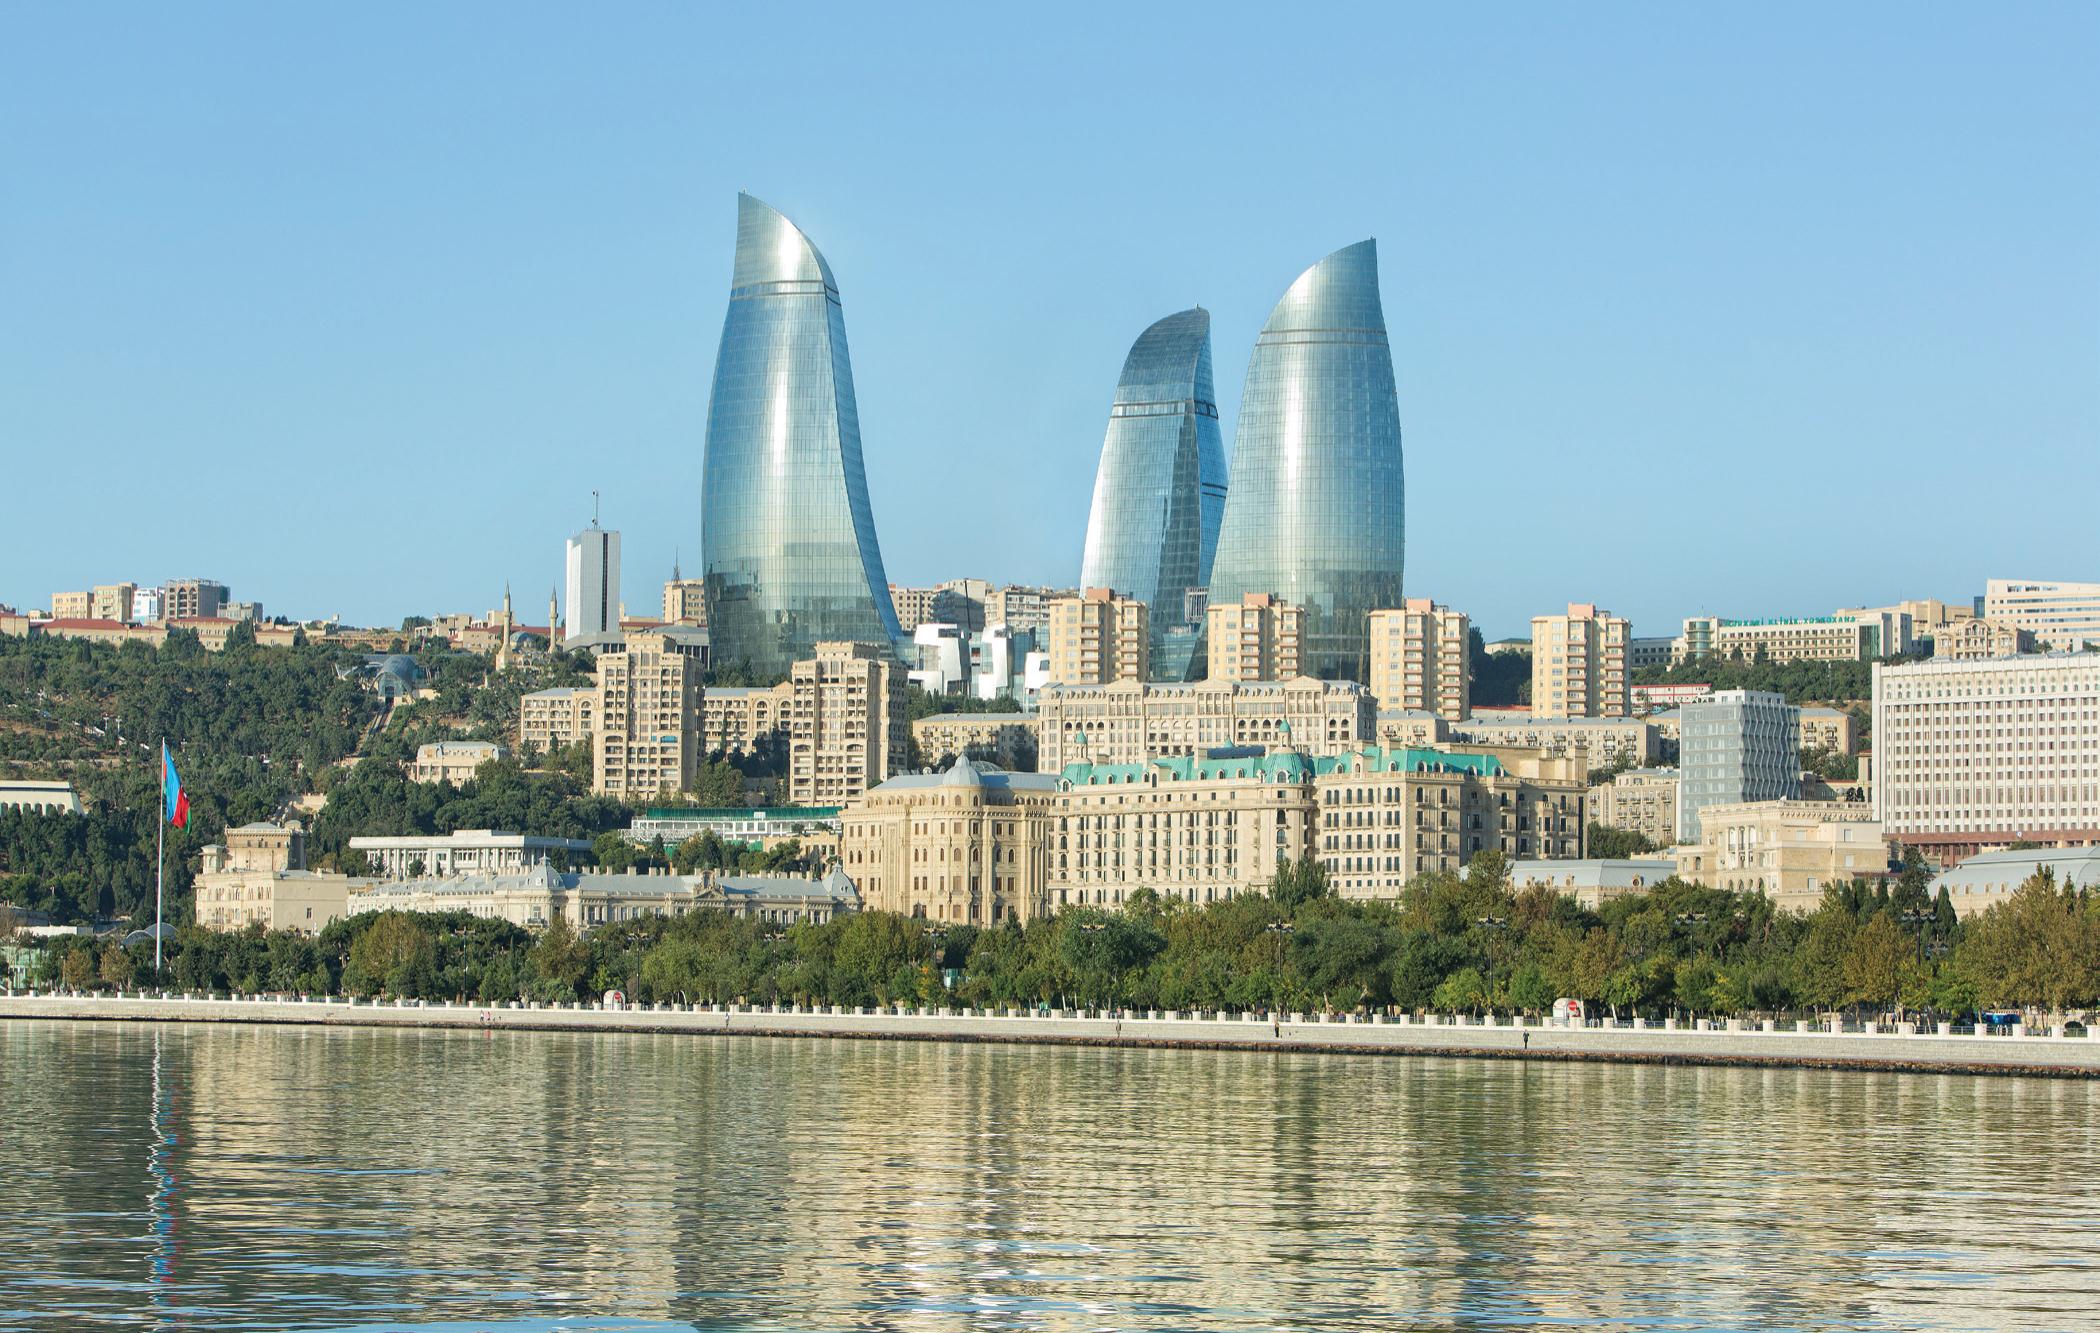 Baku's Flame Towers